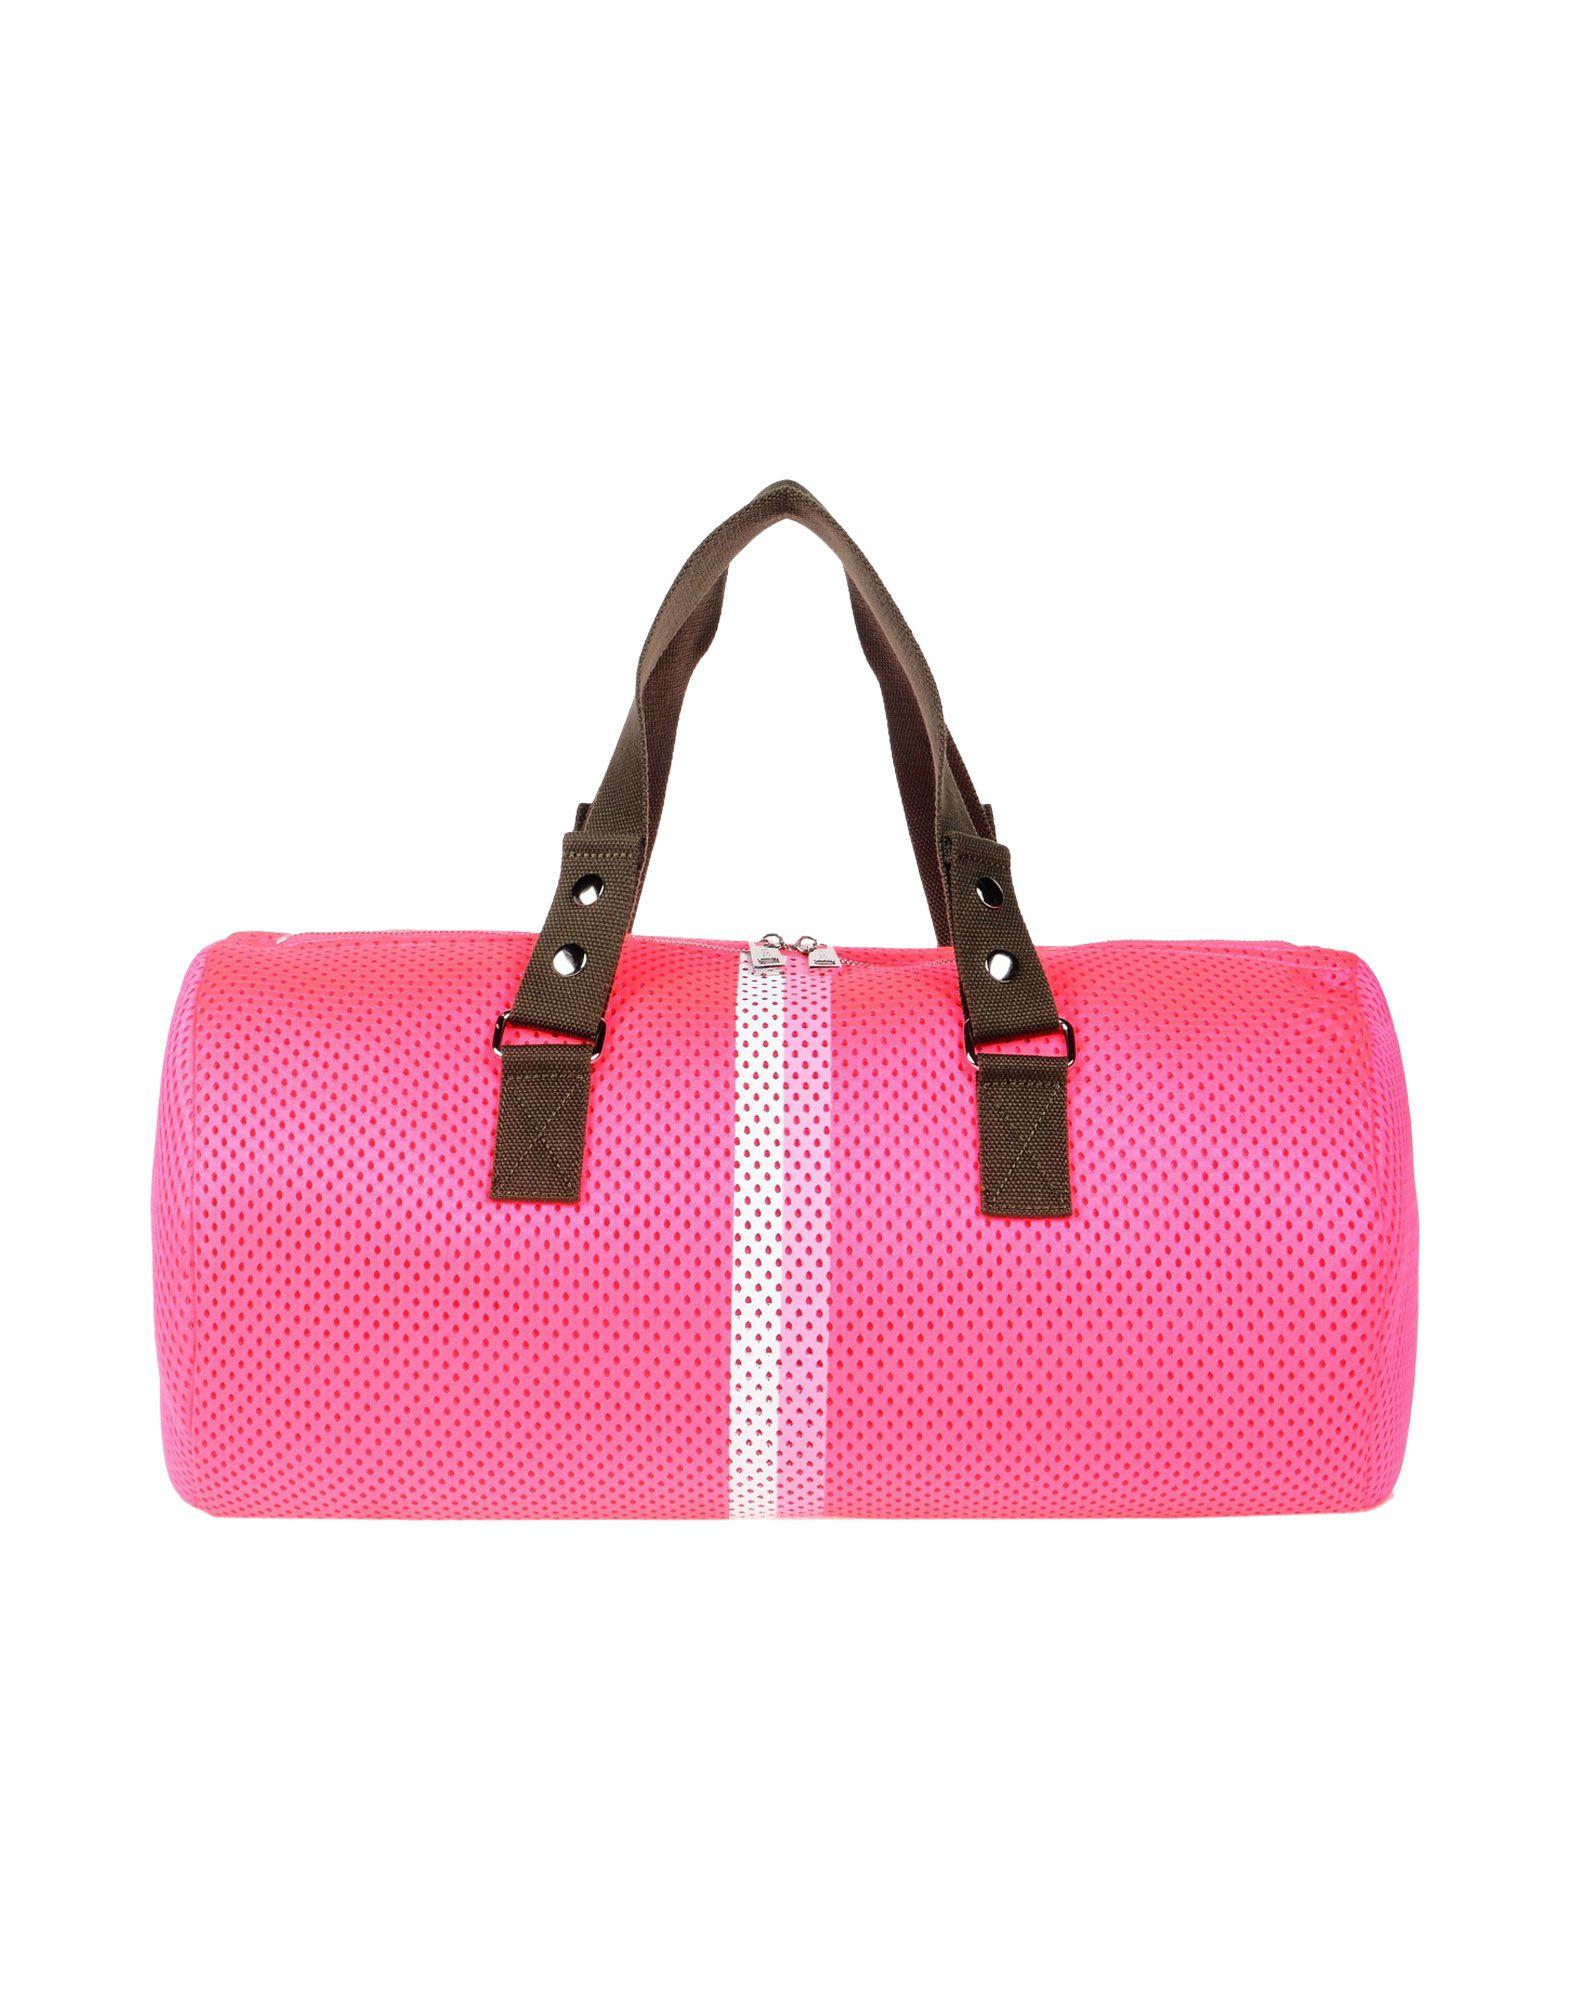 Фото - MIA BAG Дорожная сумка cow leather tote bag brand 2018 bolsa feminina new women handbag 100% genuine leather alligator shoulder bag free shipping